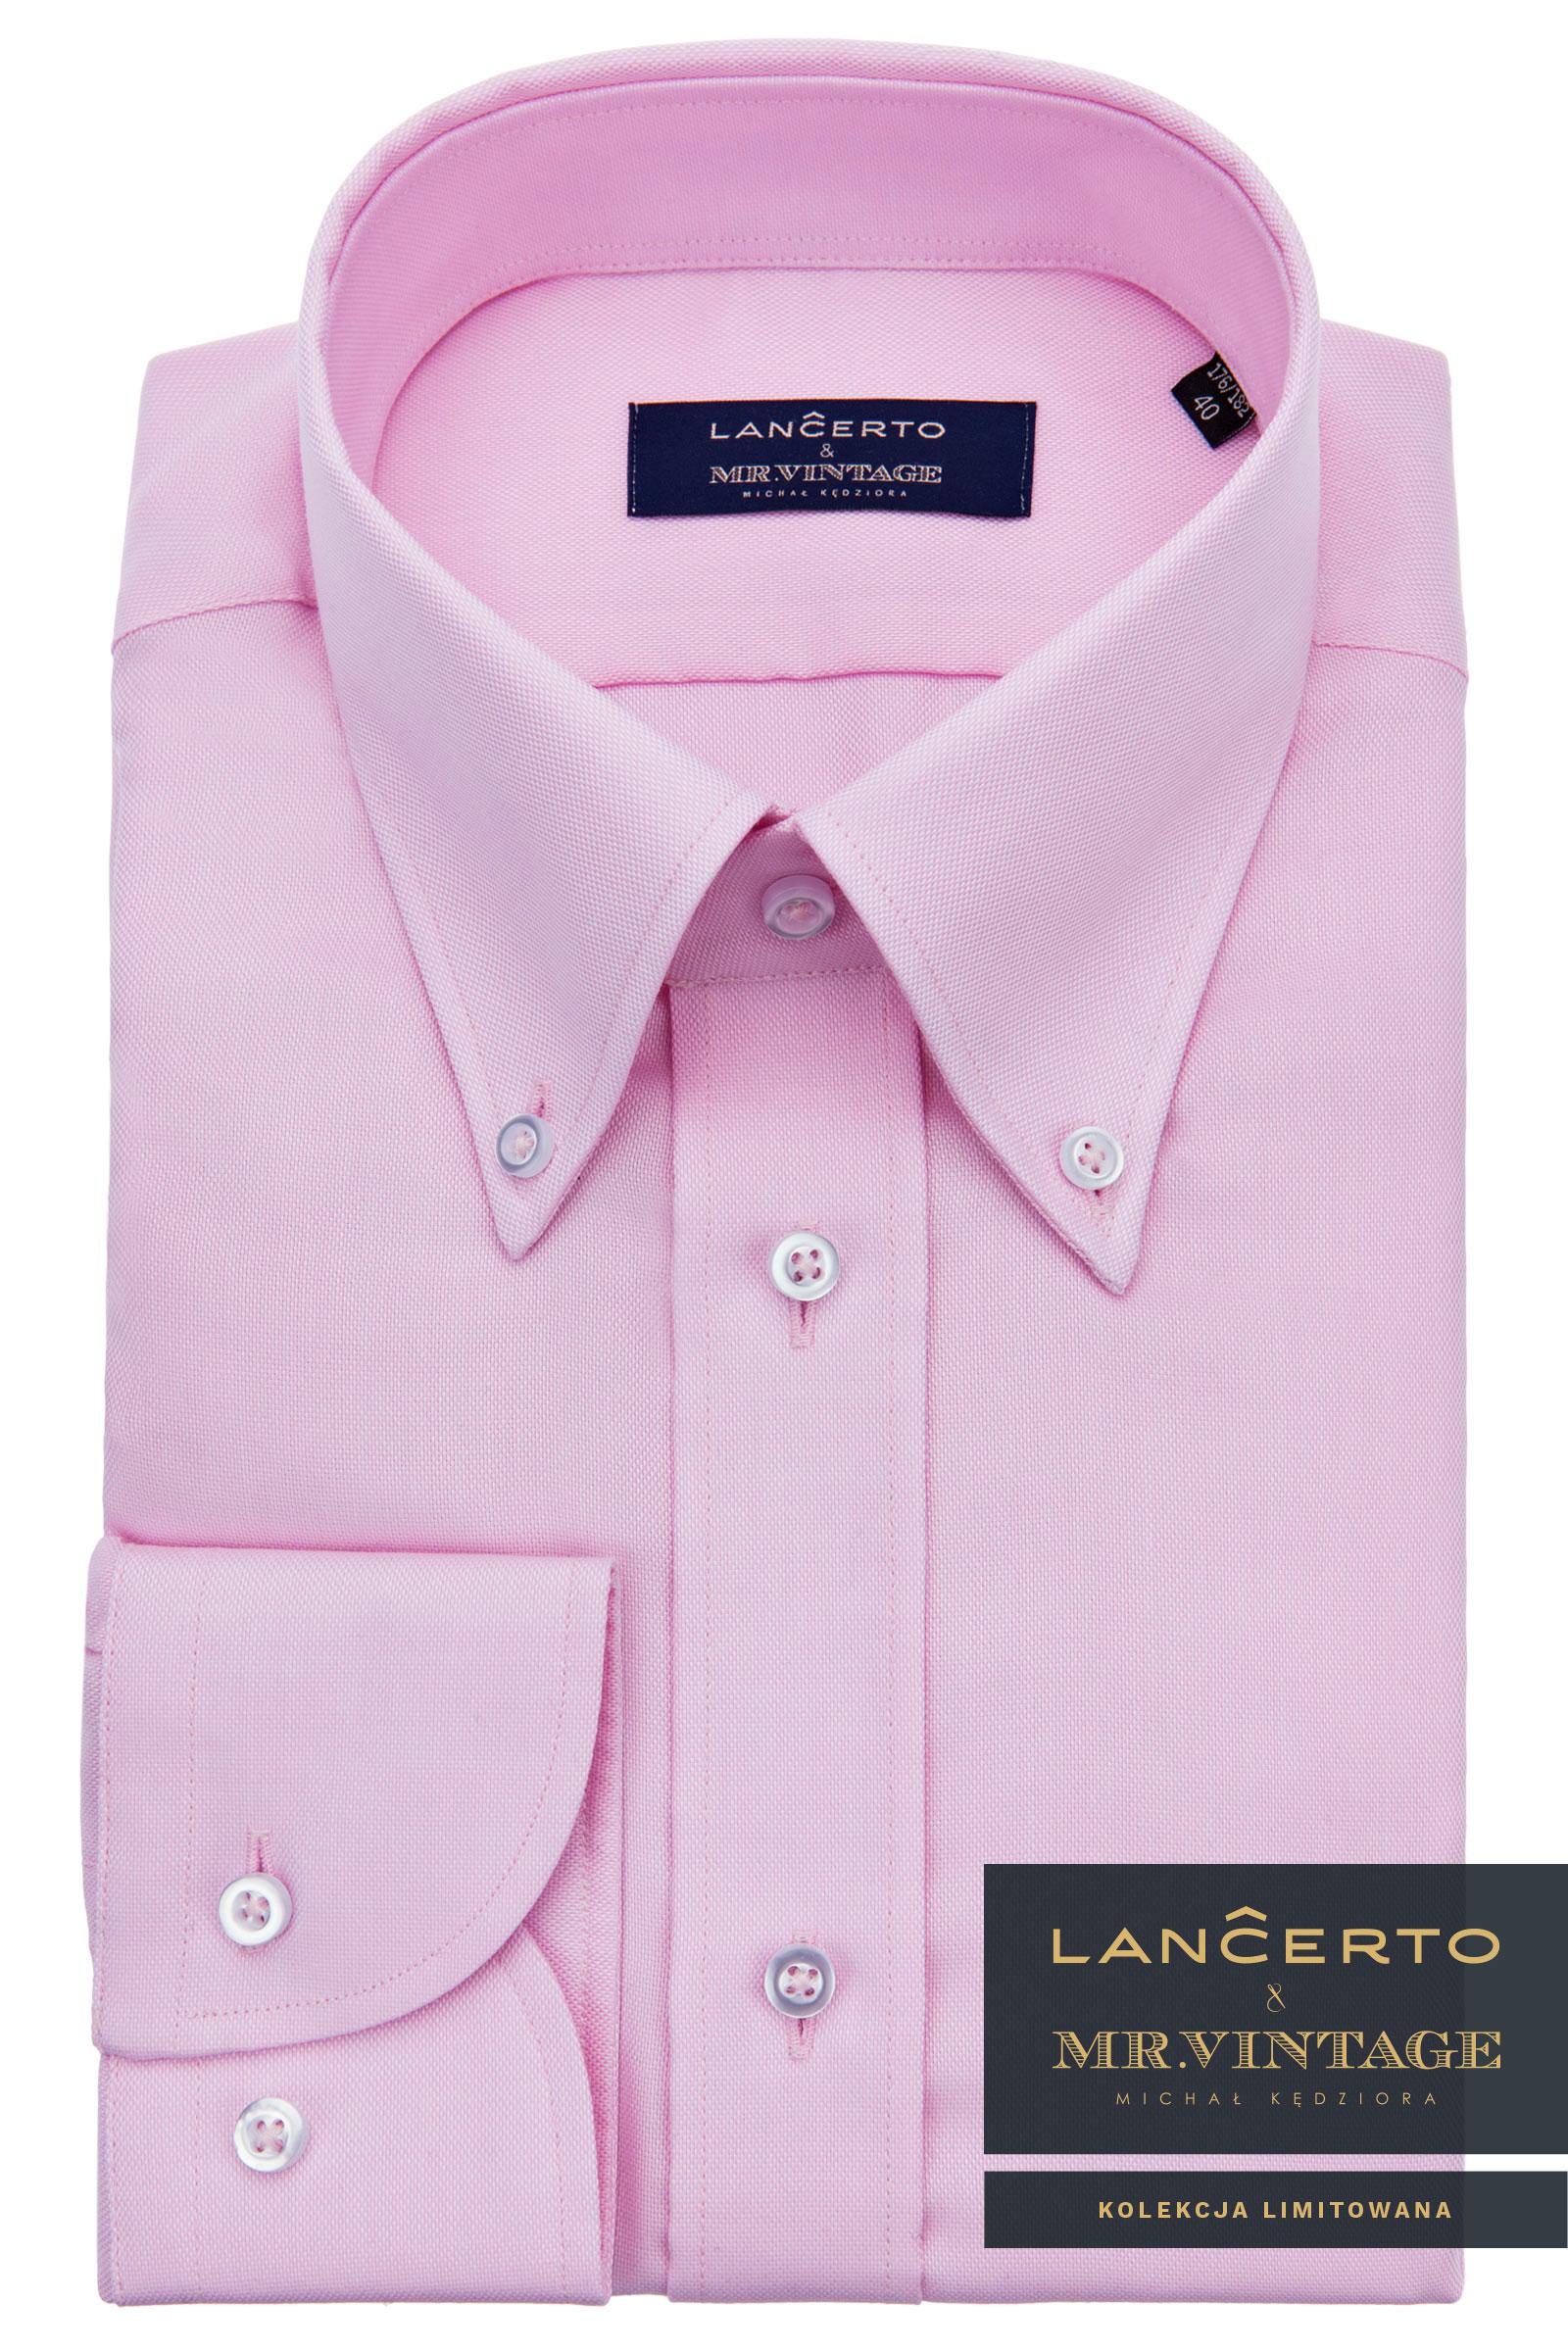 Lancerto tričko&Pán Vintage Most 176/38